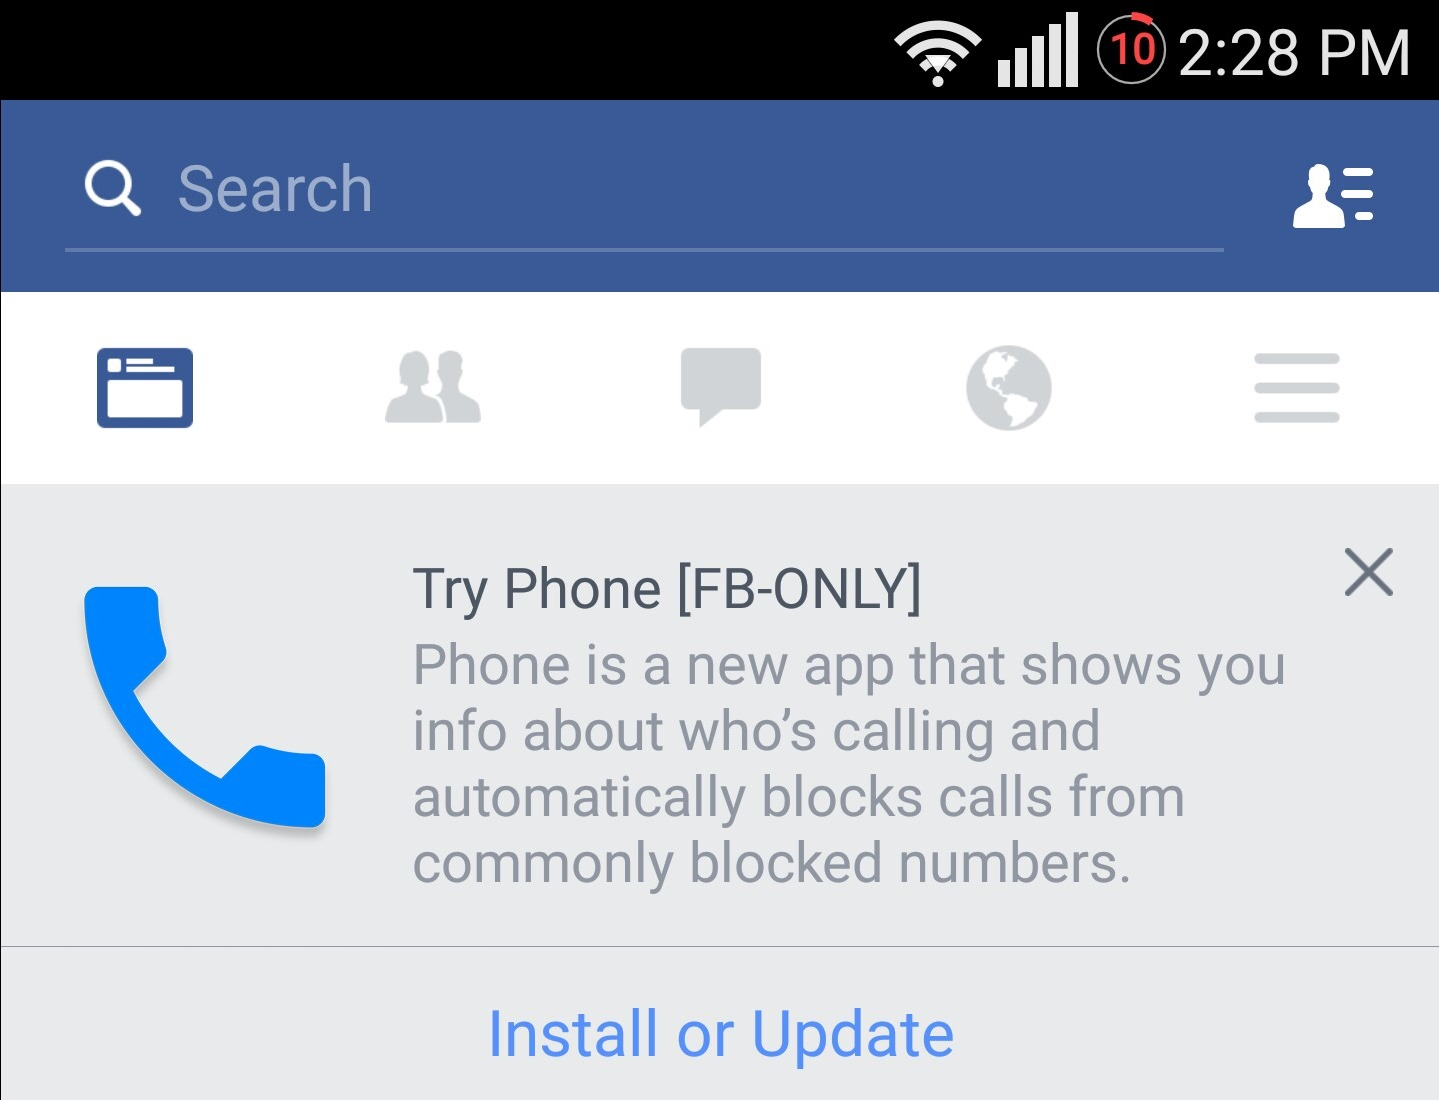 facebook_phone_install_update_message